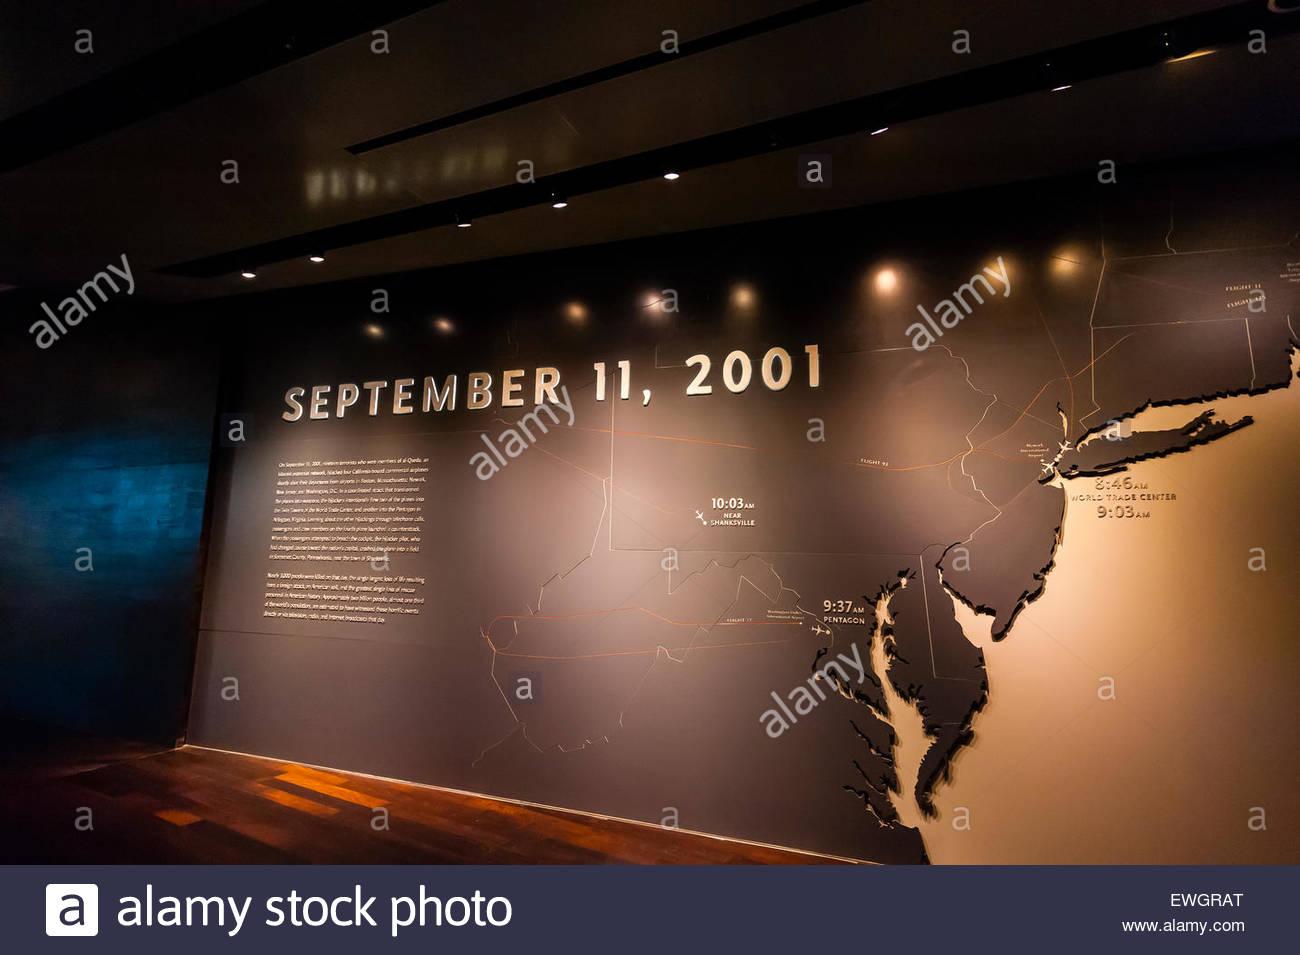 National September 11 Memorial & Museum, New York, New York USA. - Stock Image